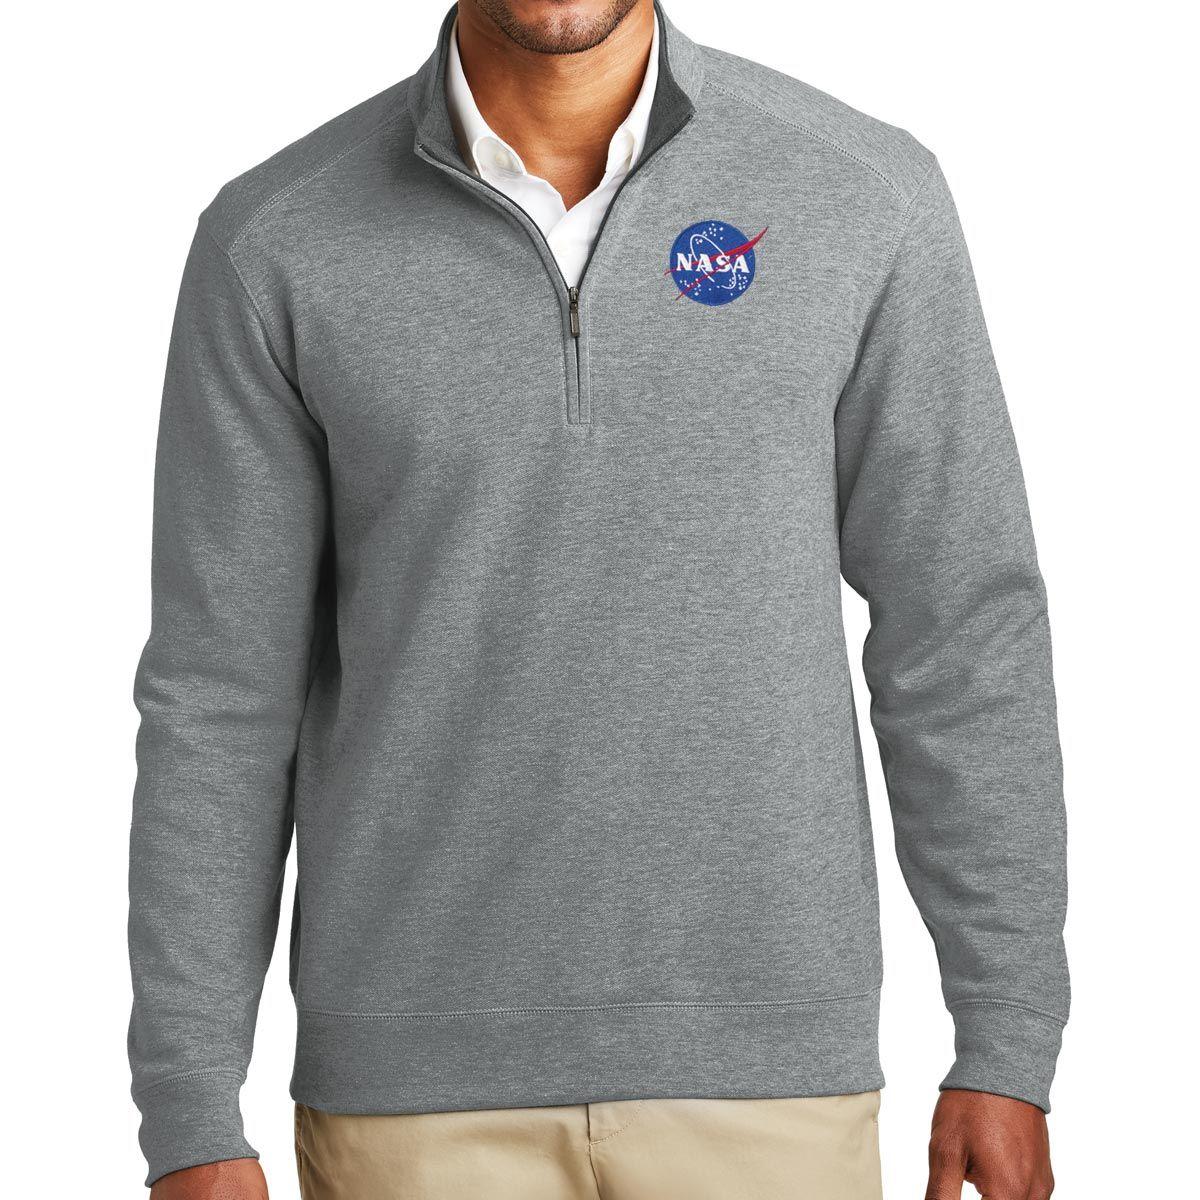 NASA WORLD SPACE  LOGO ASTRONAUT PRINT  TRENDY GEEK  MENS UNISEX  SWEAT SHIRT